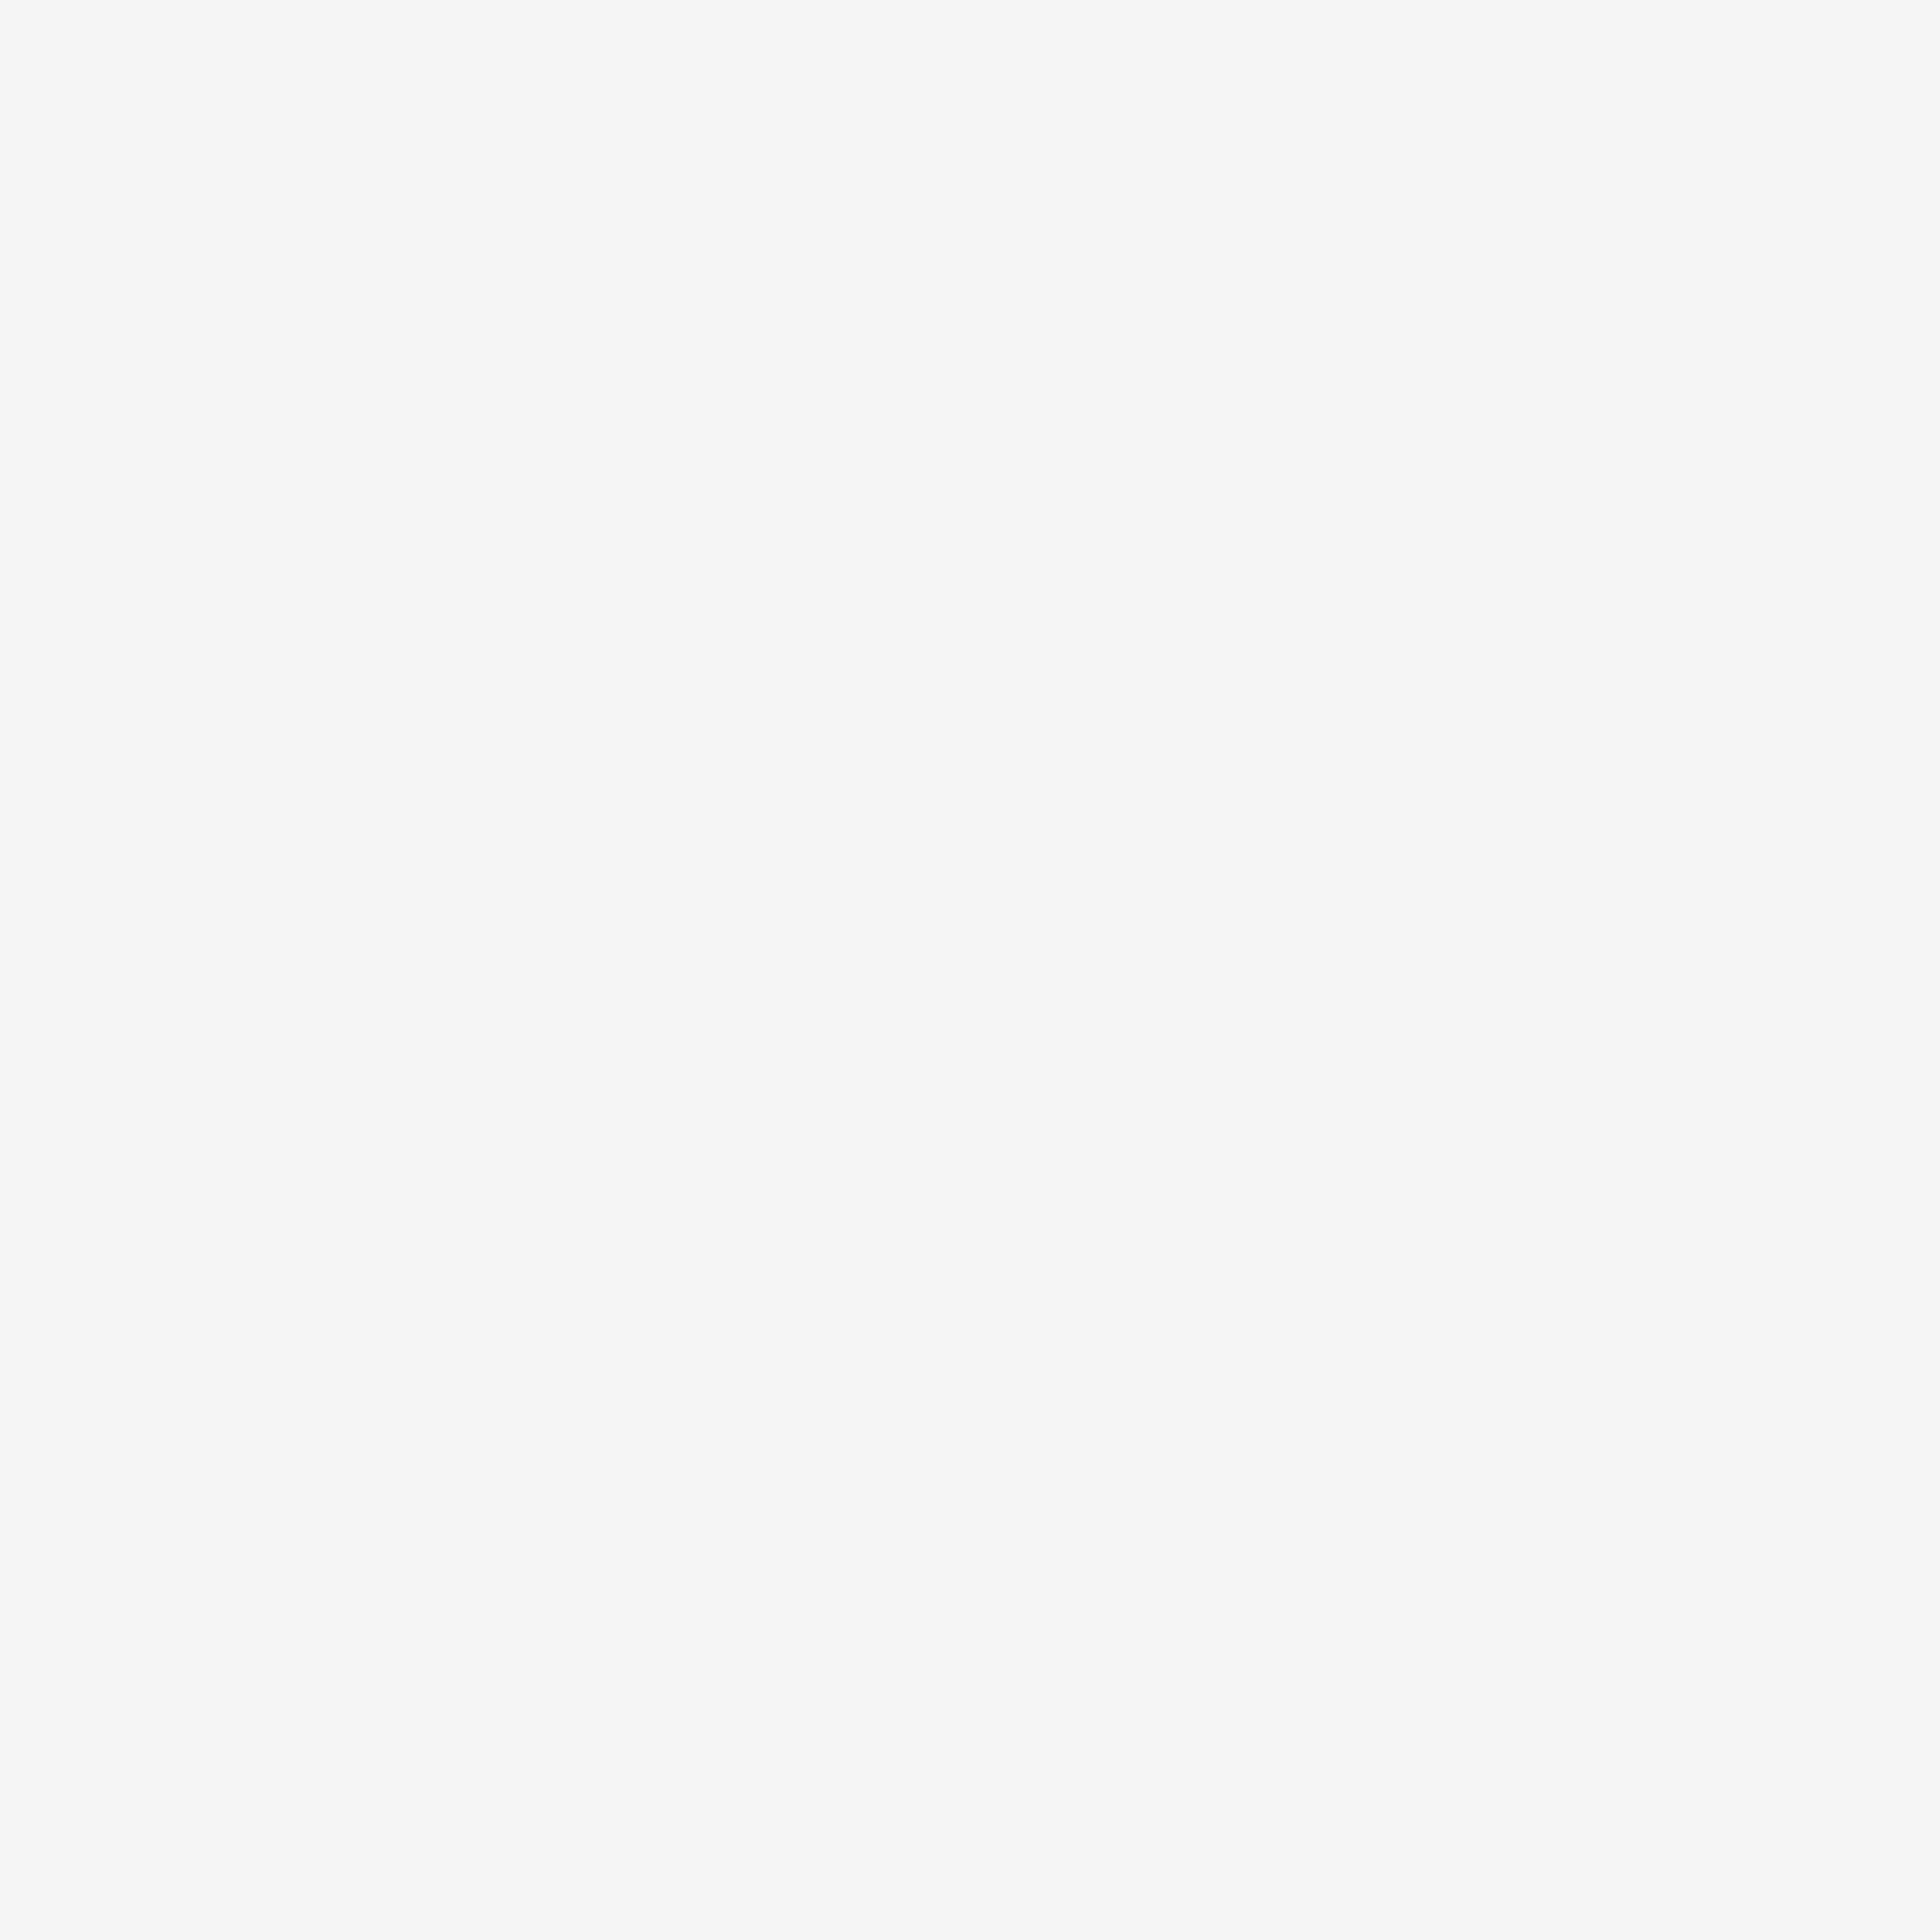 Bardossa Kinderschoenen.Bardossa Torbole Flex Online Bestellen Oxener Schoenen